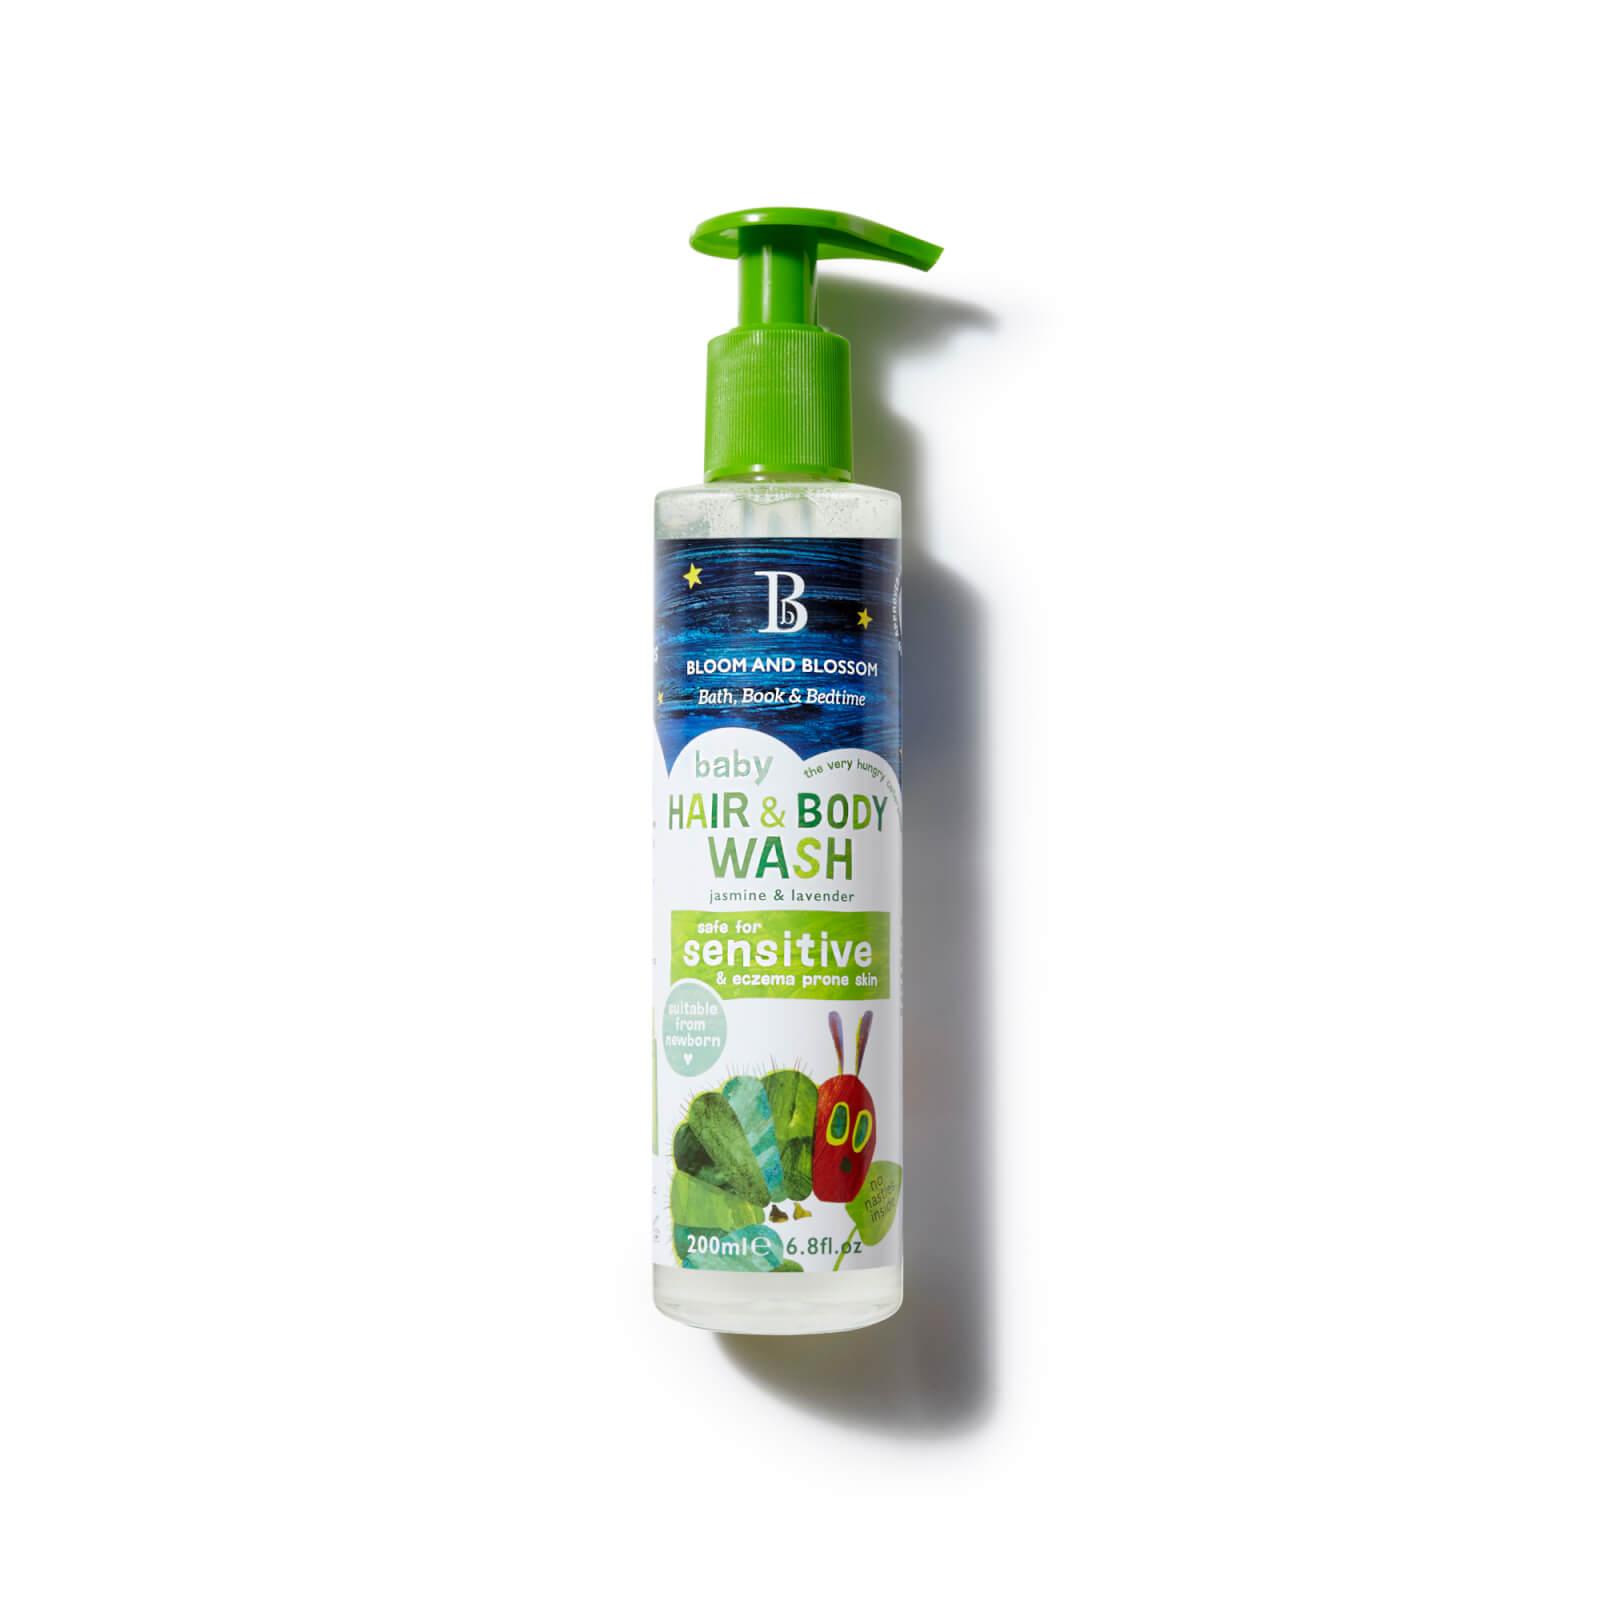 Купить Bloom and Blossom The Very Hungry Caterpillar Baby Hair & Body Wash 200ml